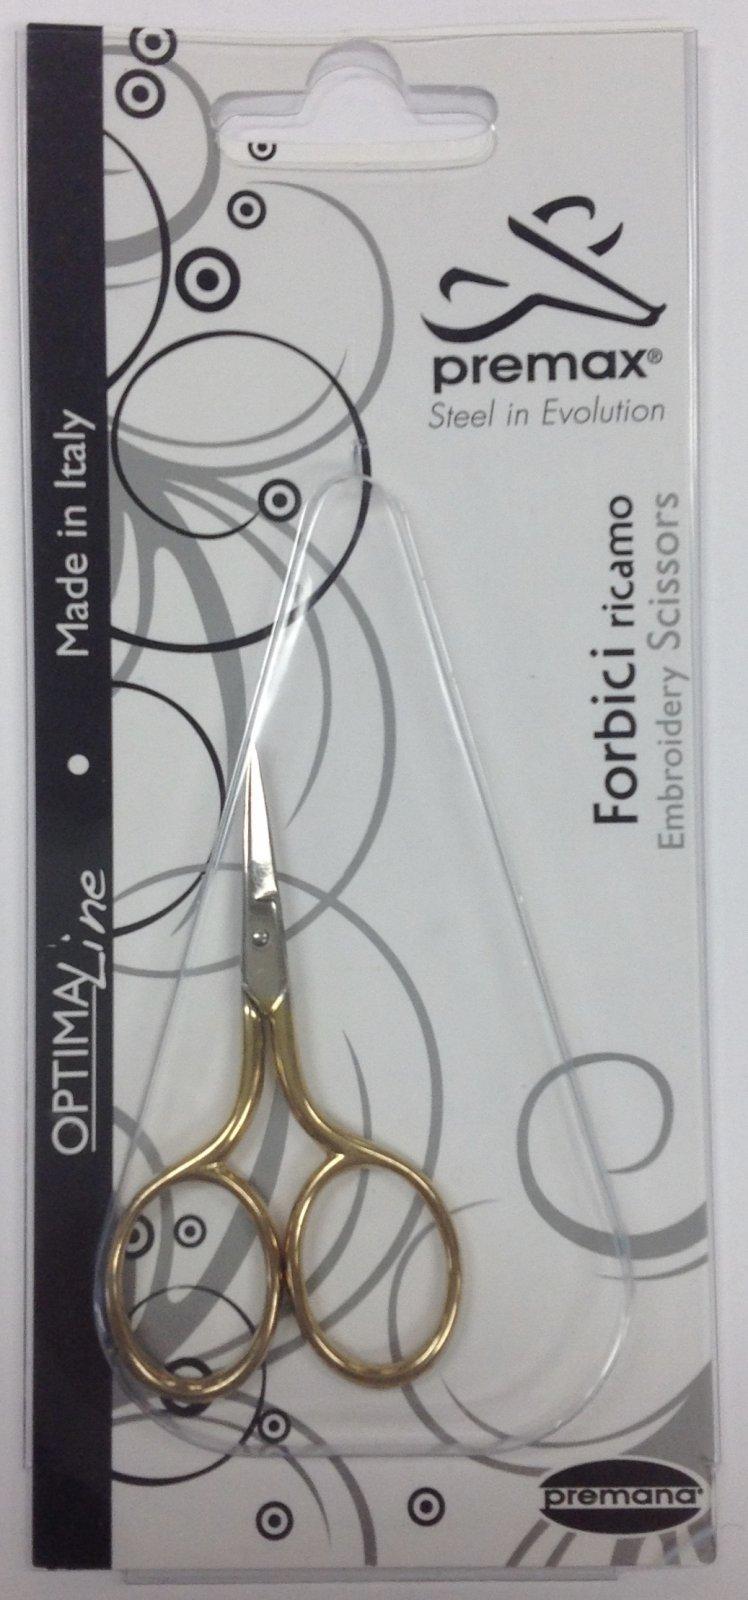 oremax embroidery gold scissors